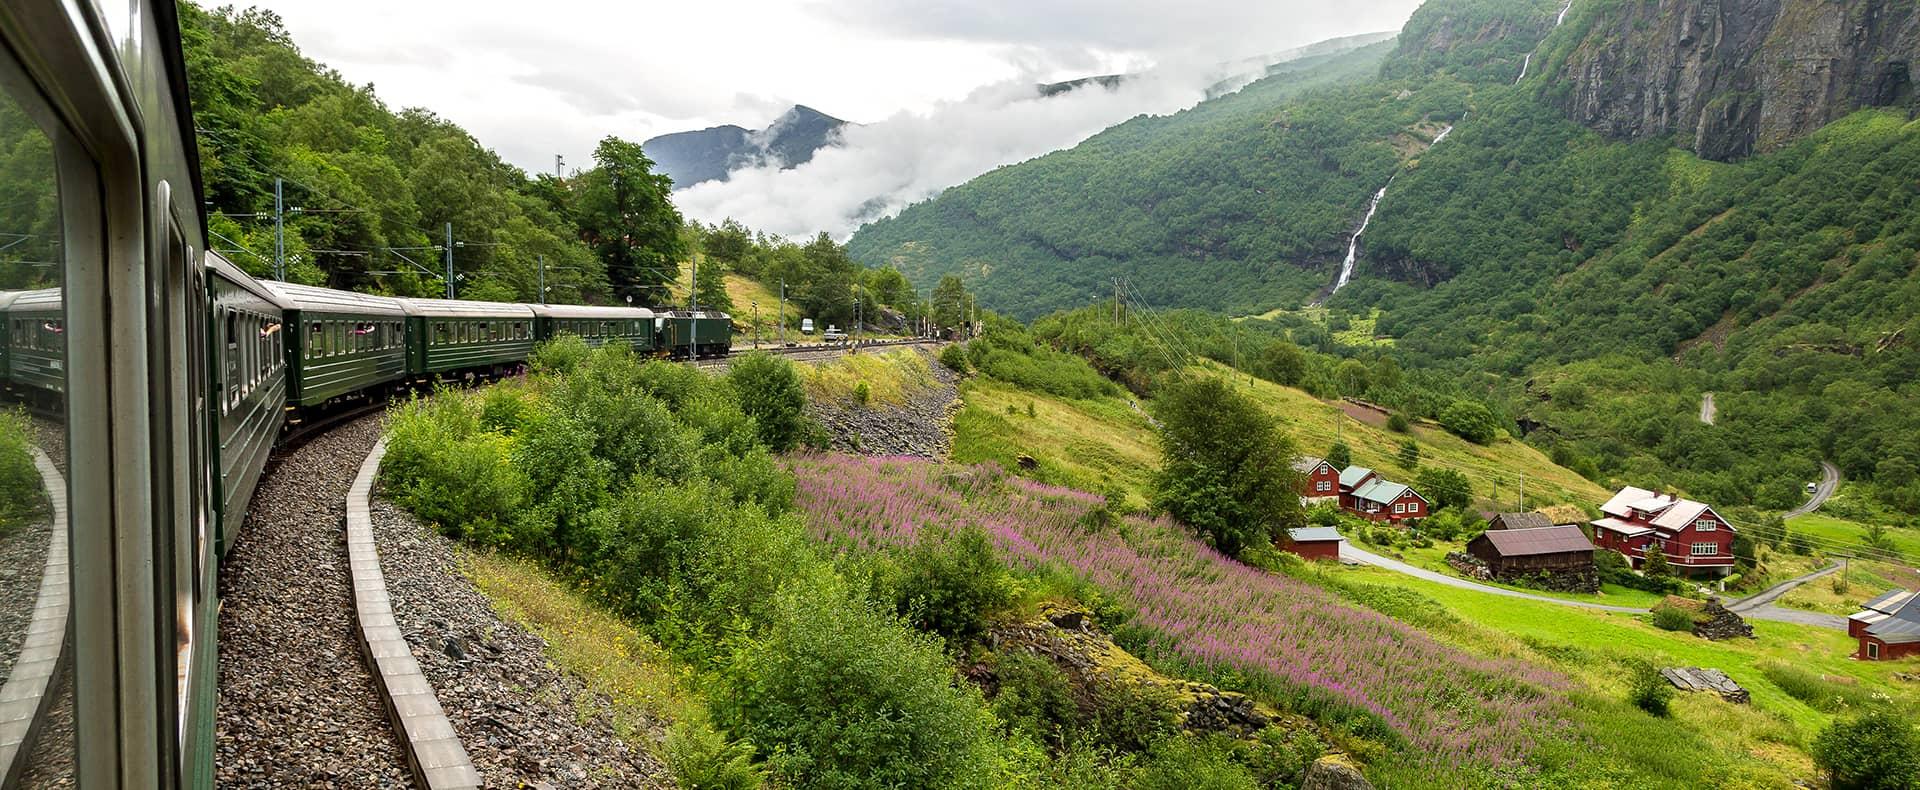 Flam, Norway